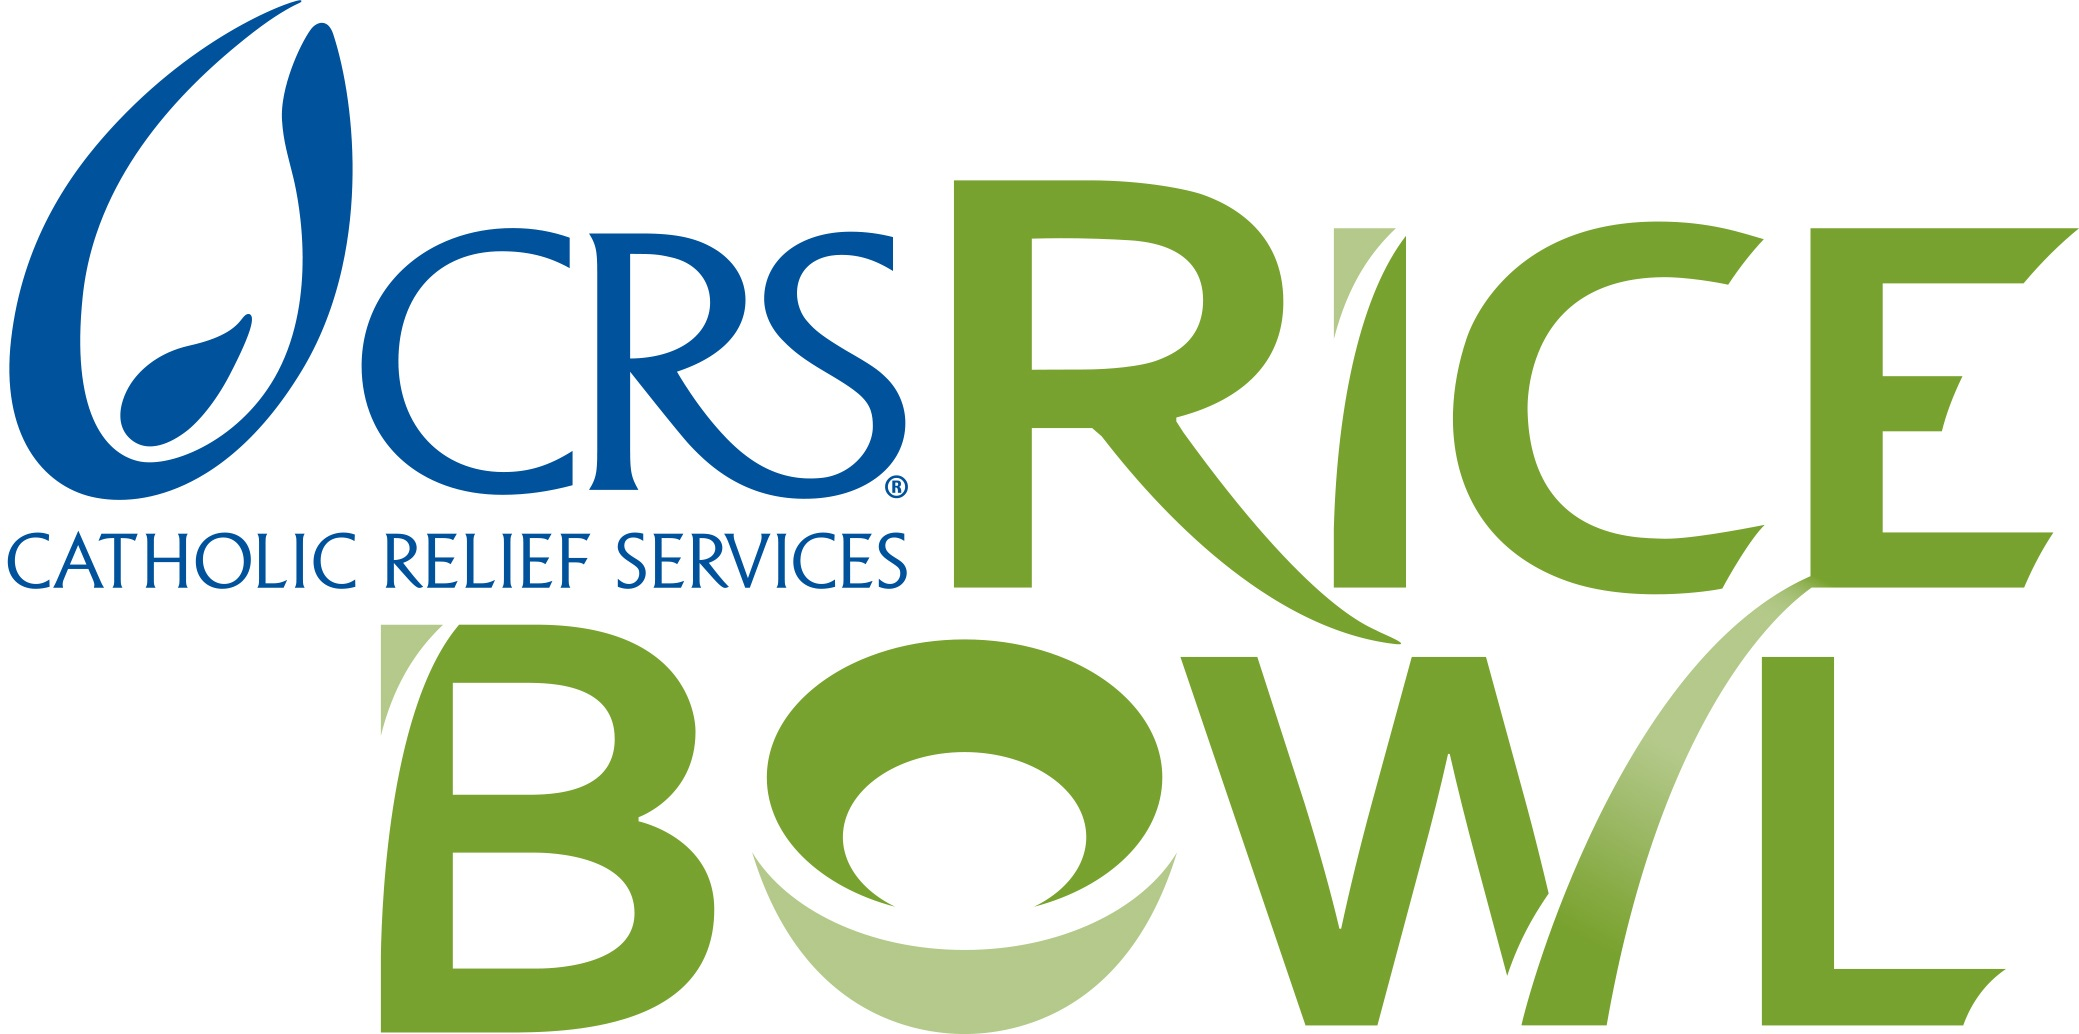 CRS RiceBowl English.jpg